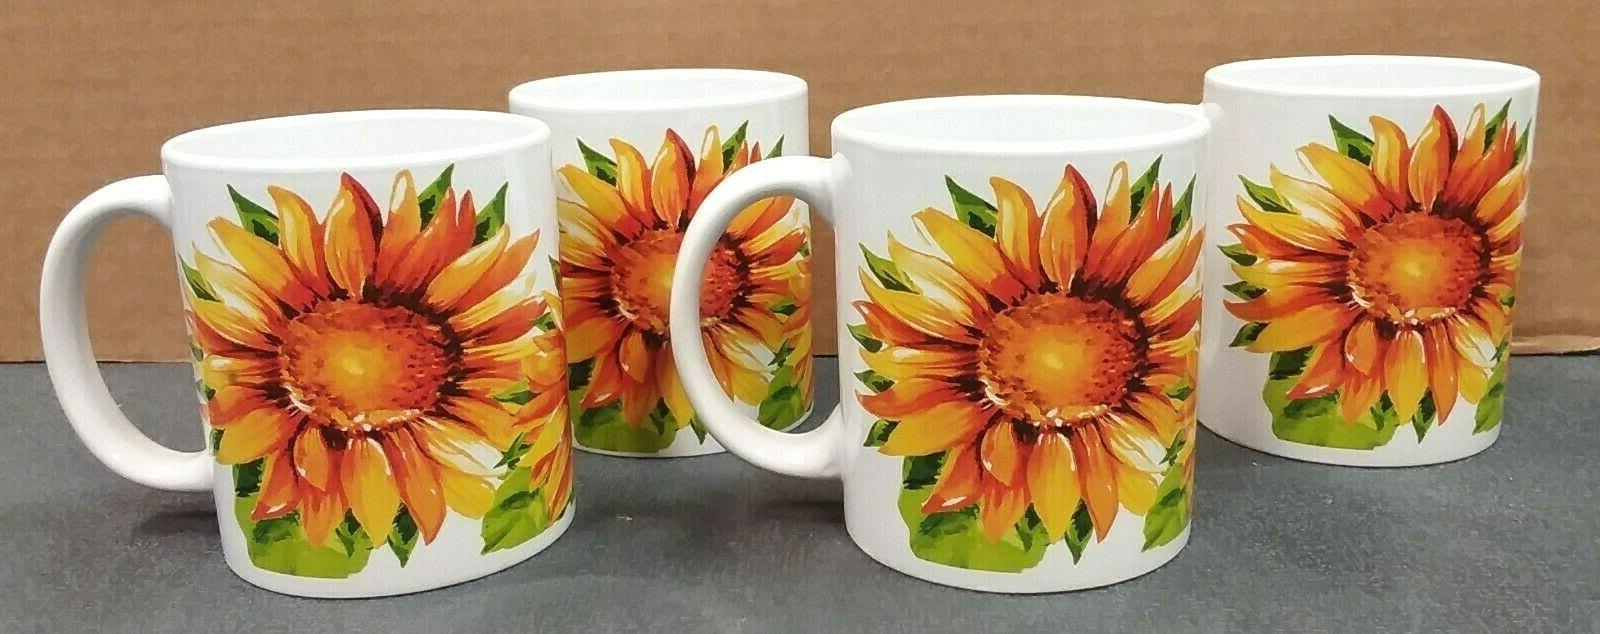 sunflower dinnerware home collection set 16 piece